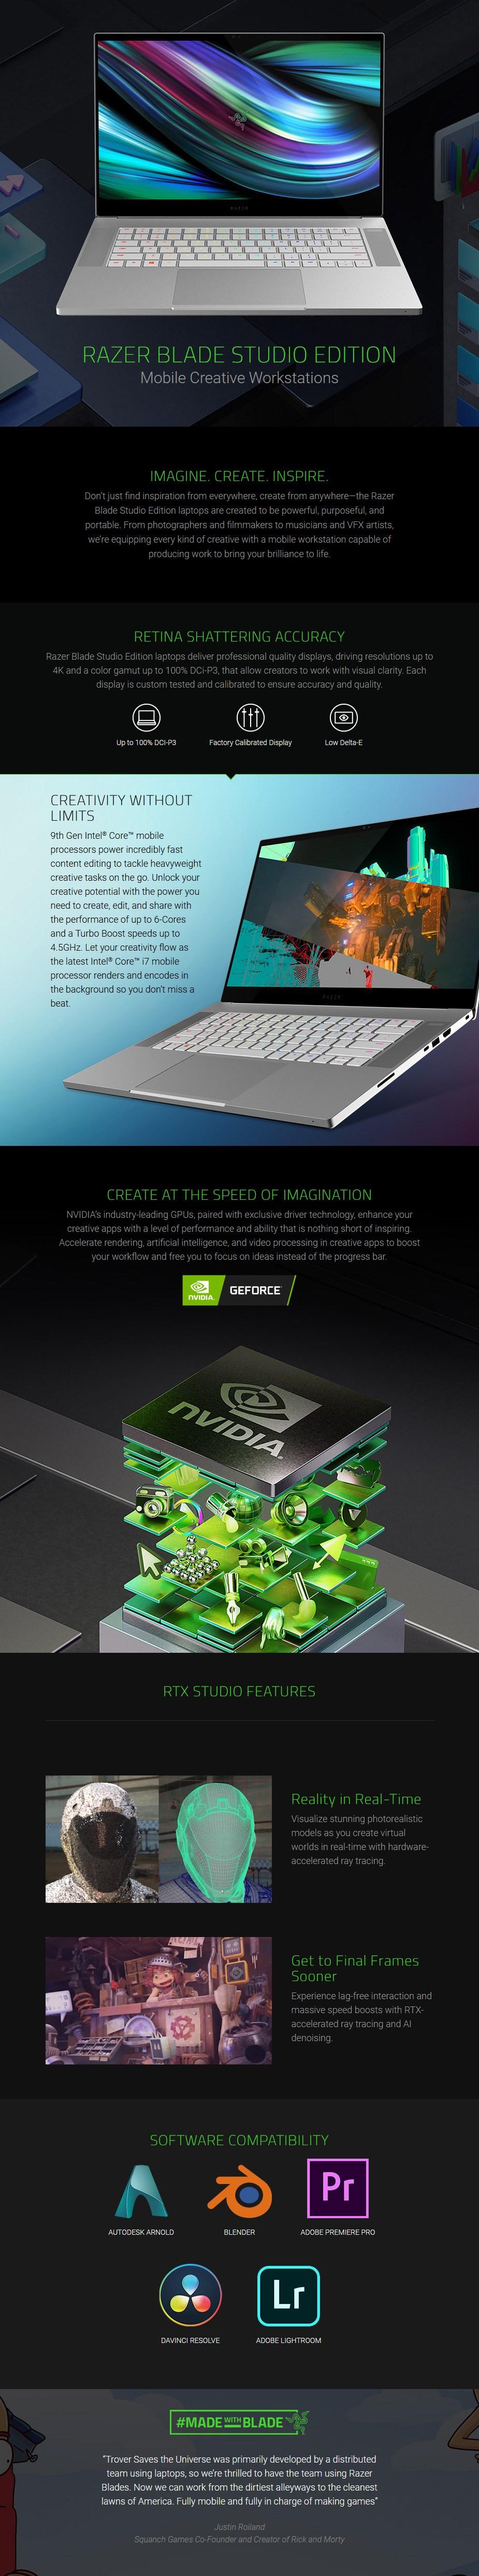 "Razer Blade 15 Studio 15.6"" 4K Laptop i7 32GB 1TB Quadro RTX 5000 W10P Touch - Overview 1"